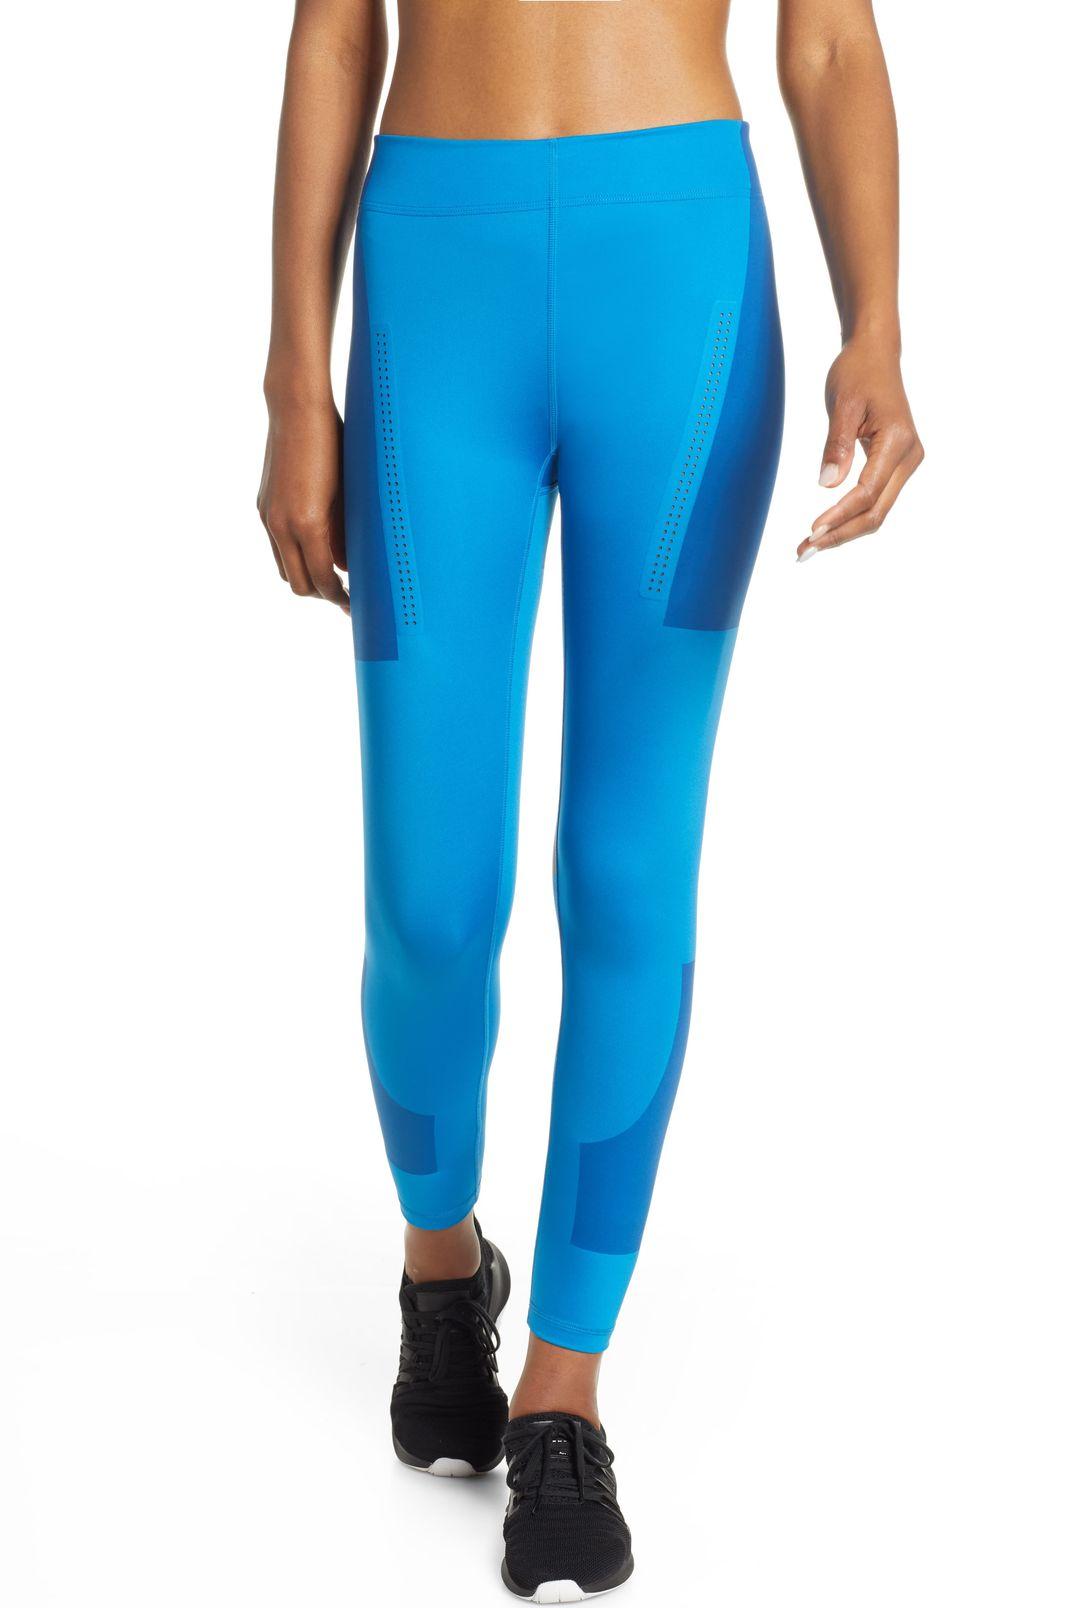 Adidas by Stella McCartney High Intensity Training Tights